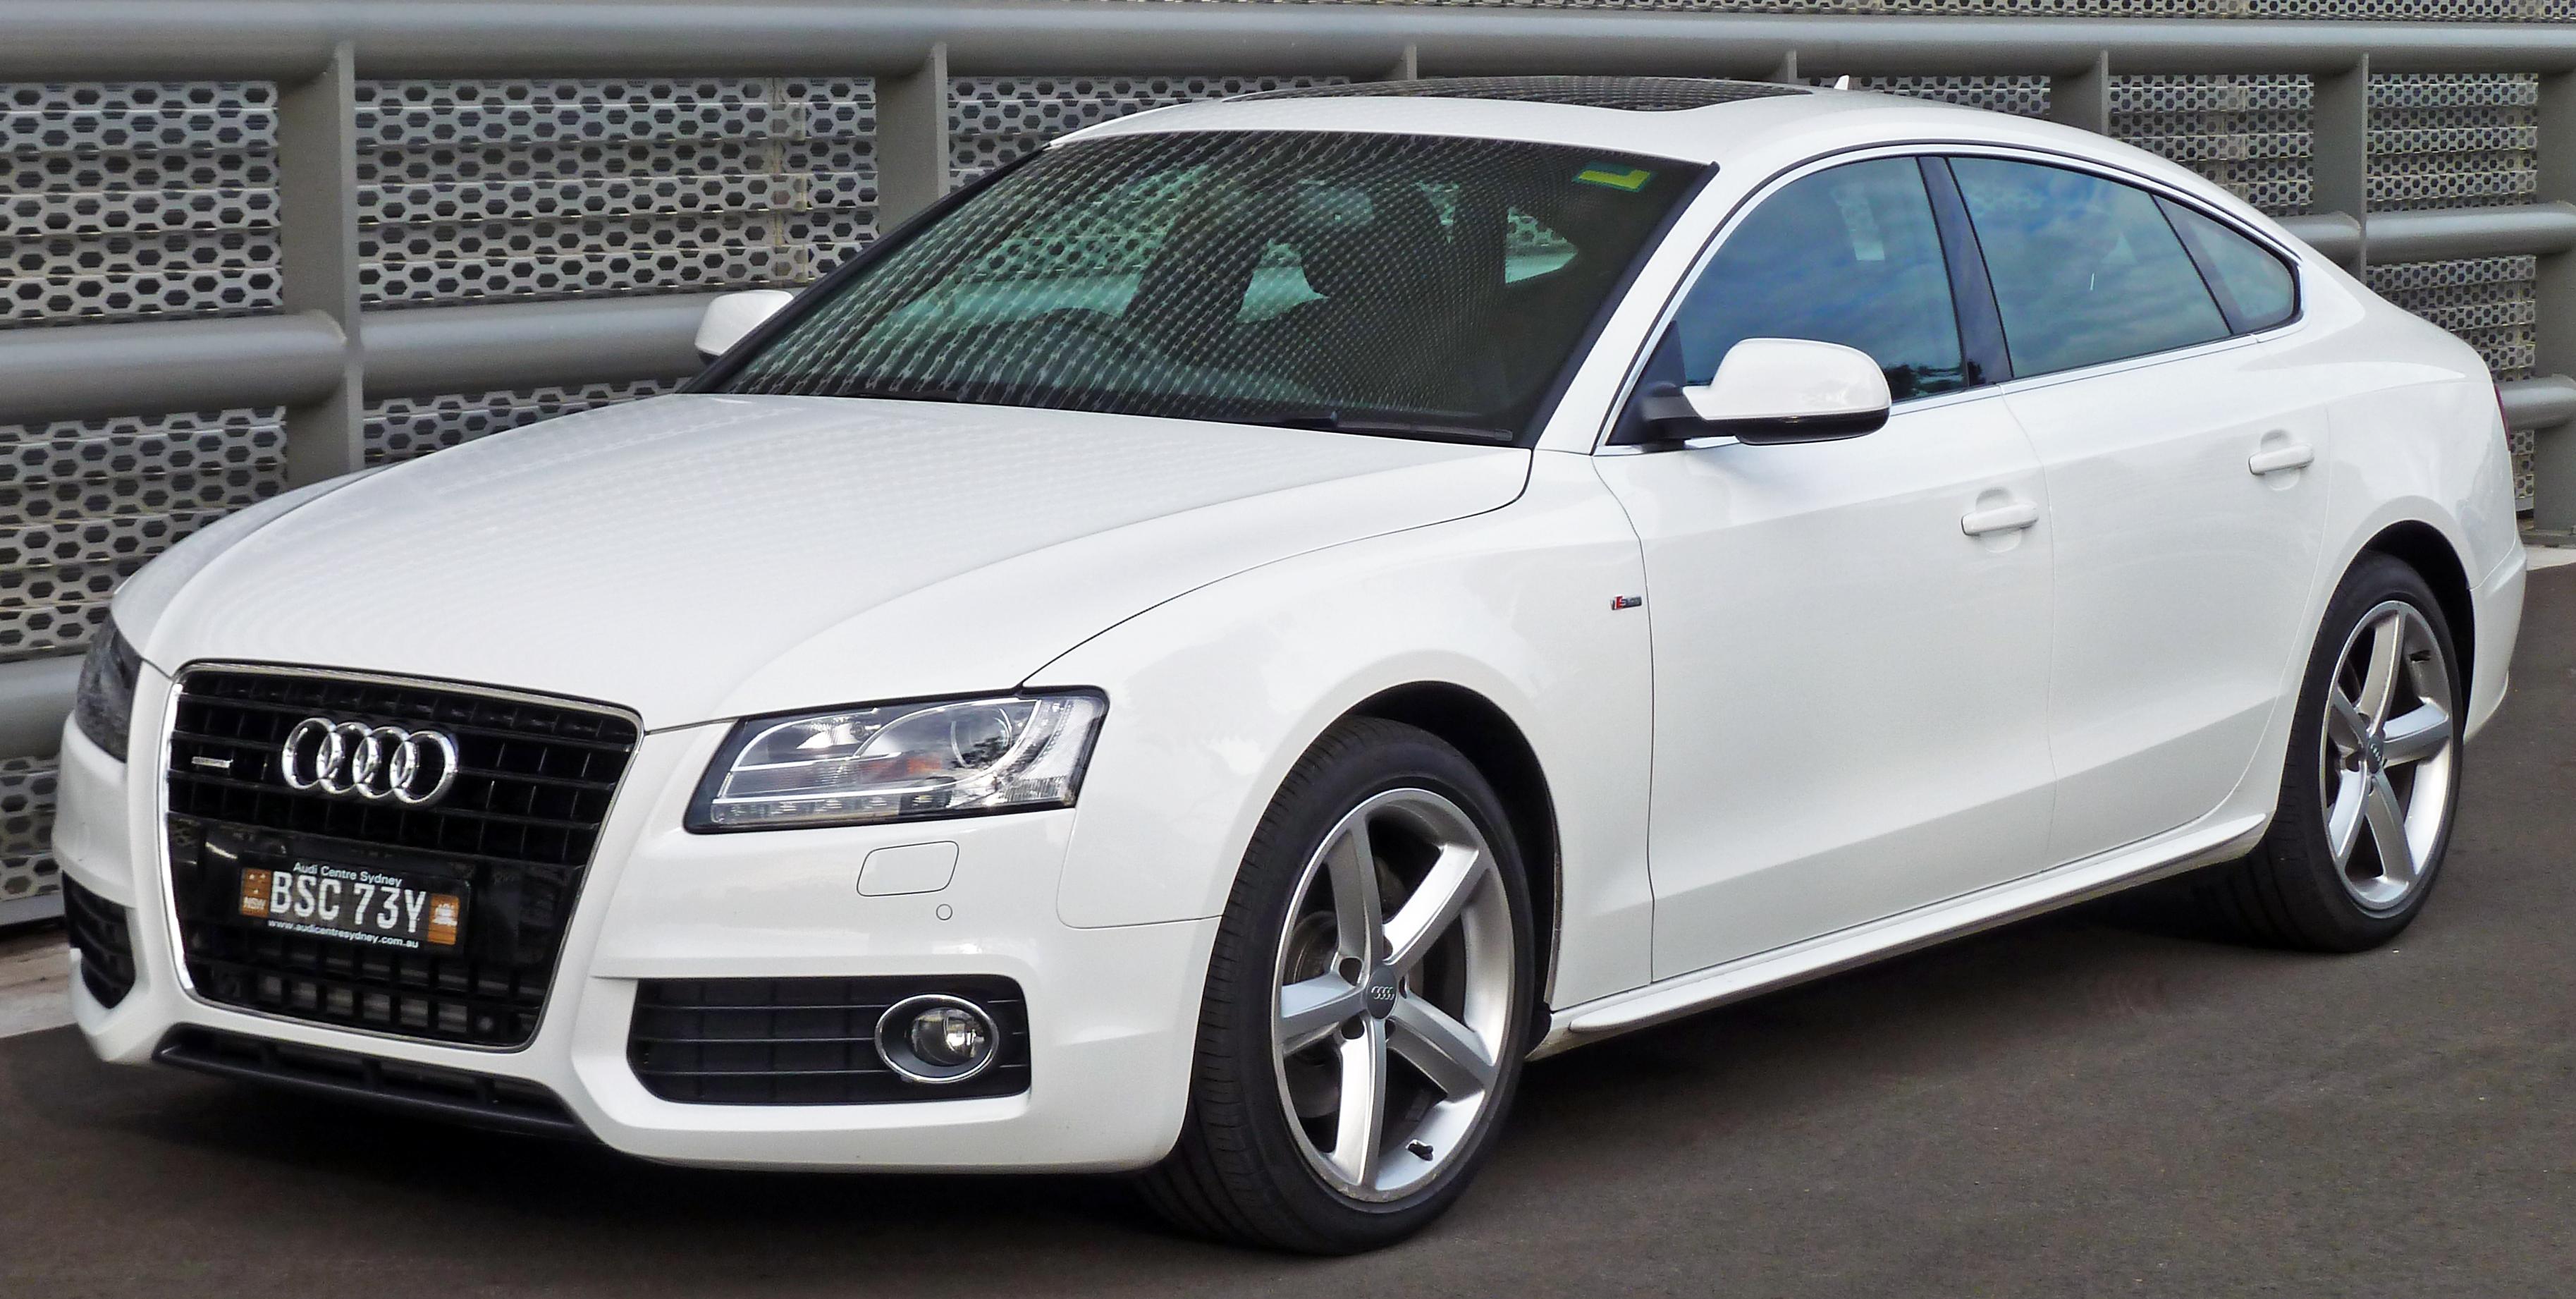 Audi A Information And Photos ZombieDrive - Audi car origin